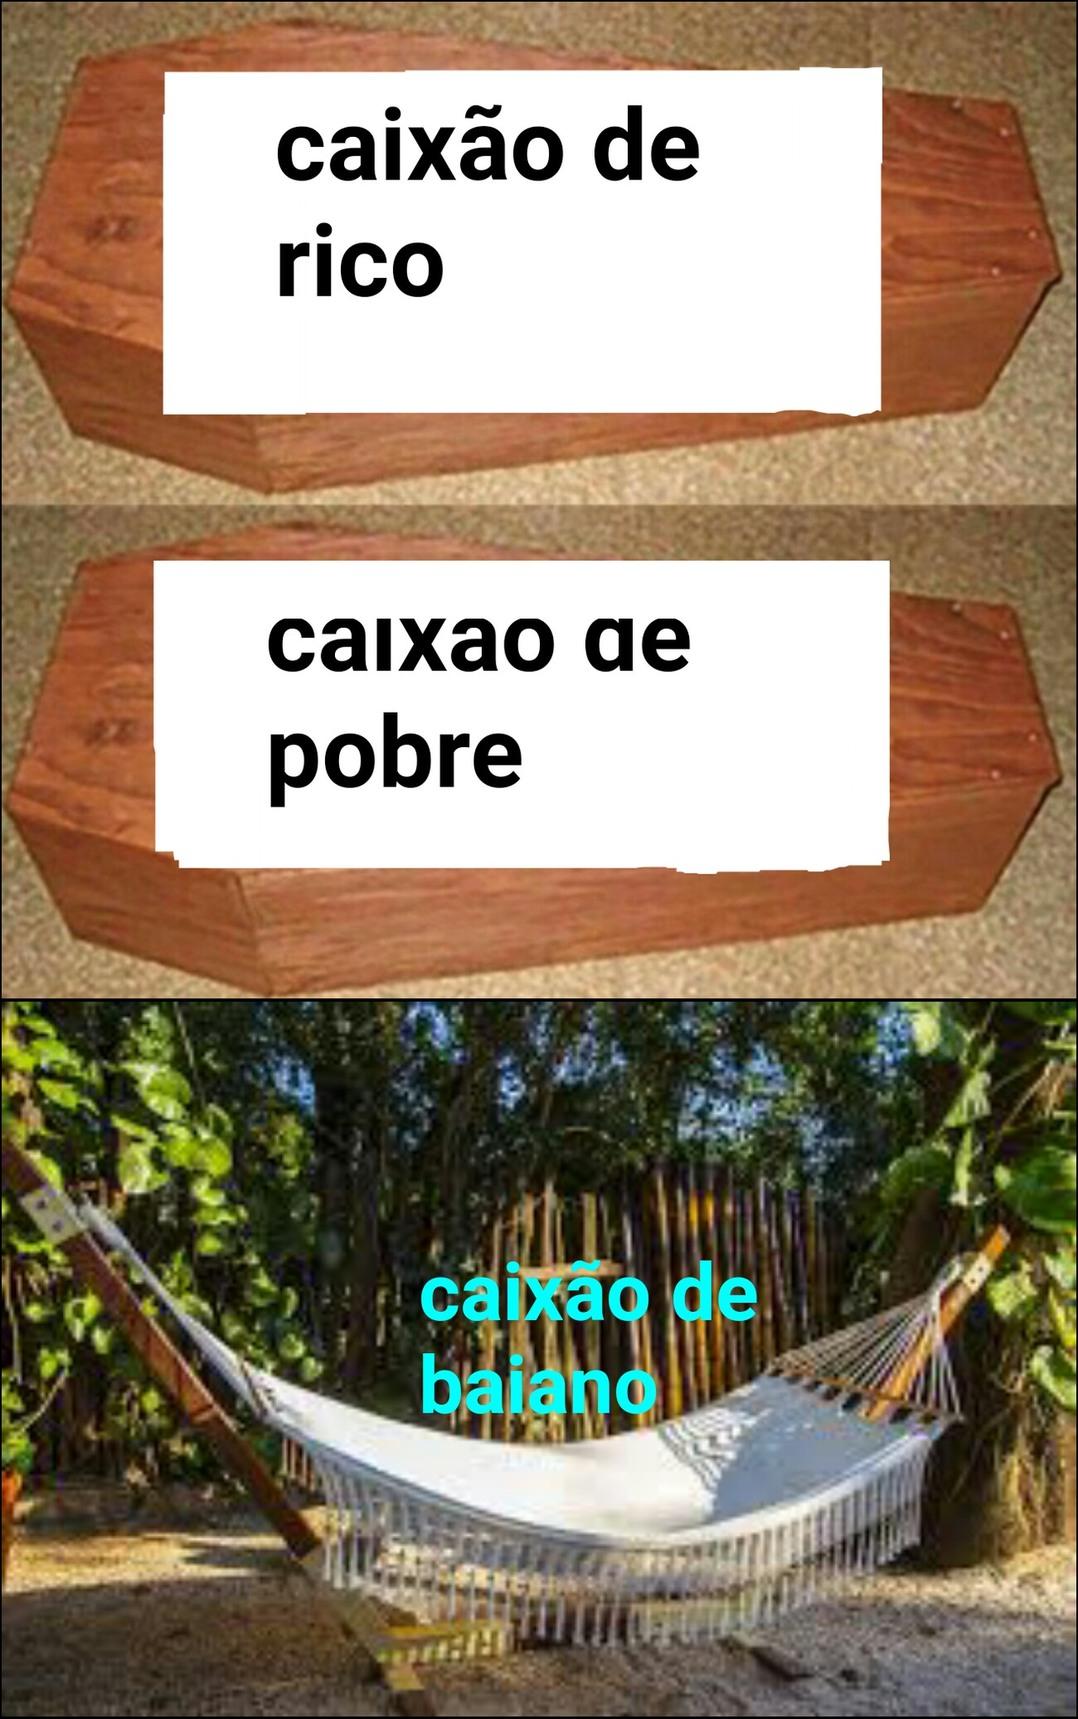 Baianor - meme